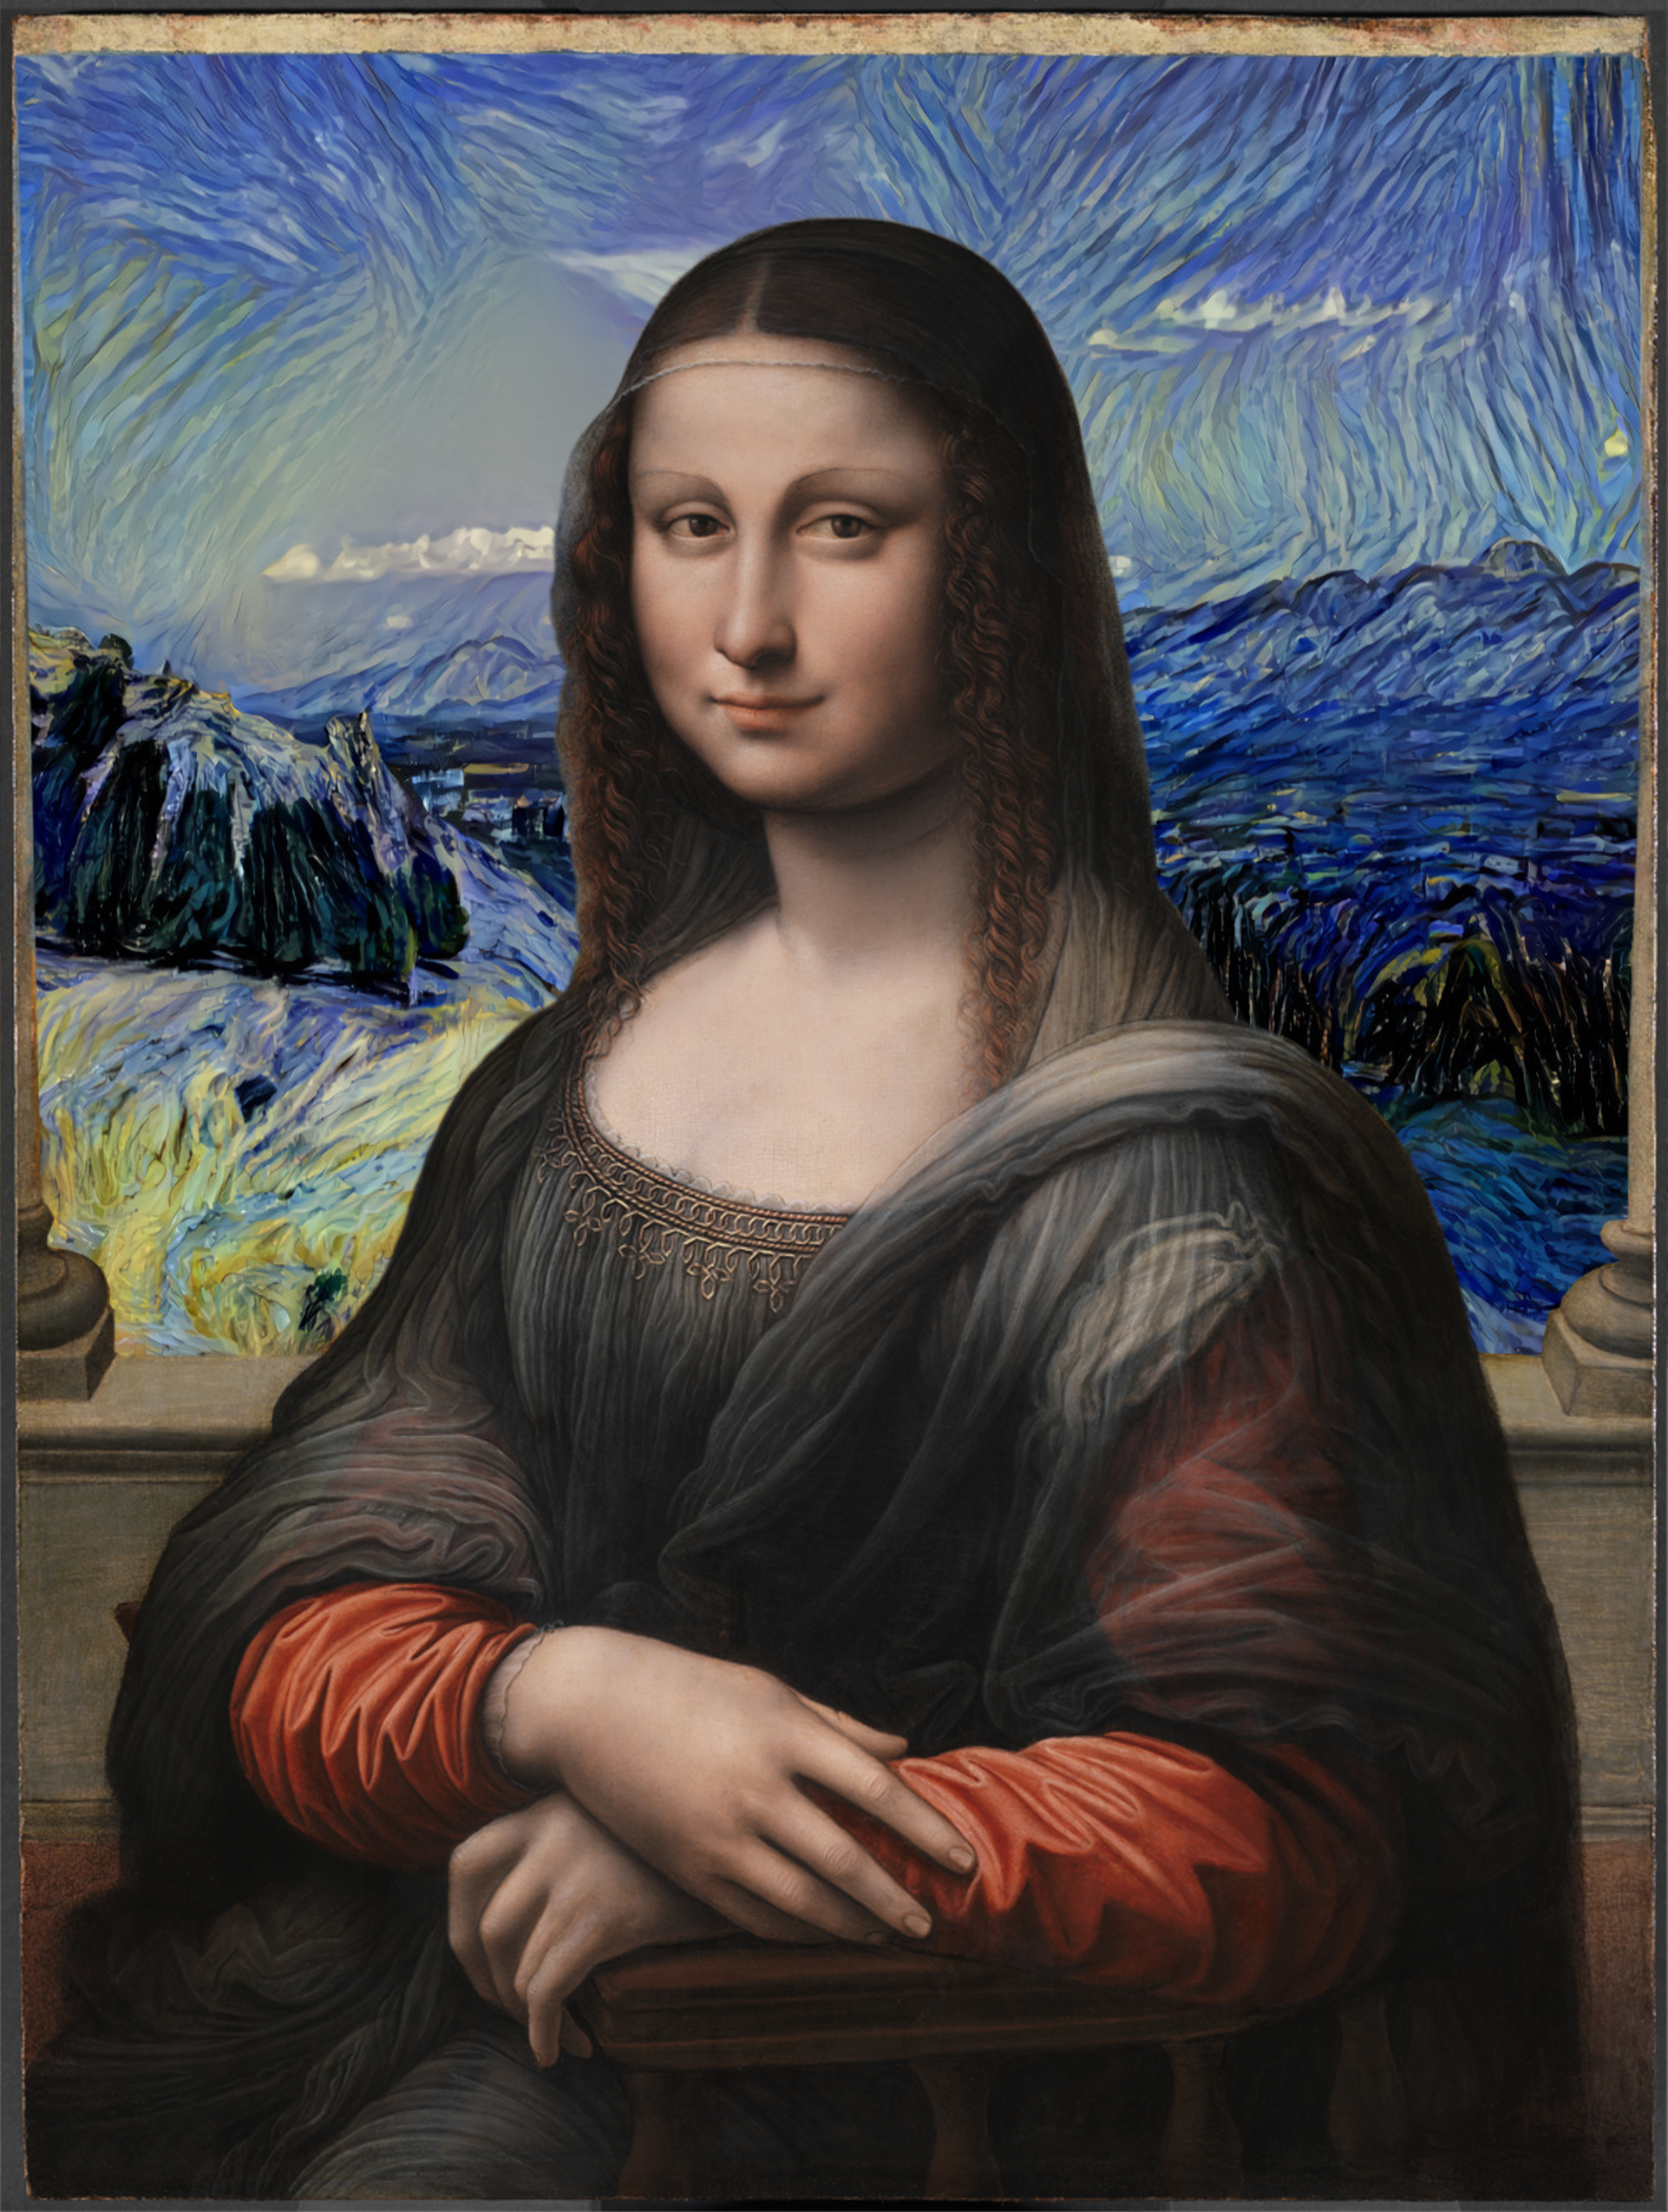 La Monalisa Lmac 2.jpg